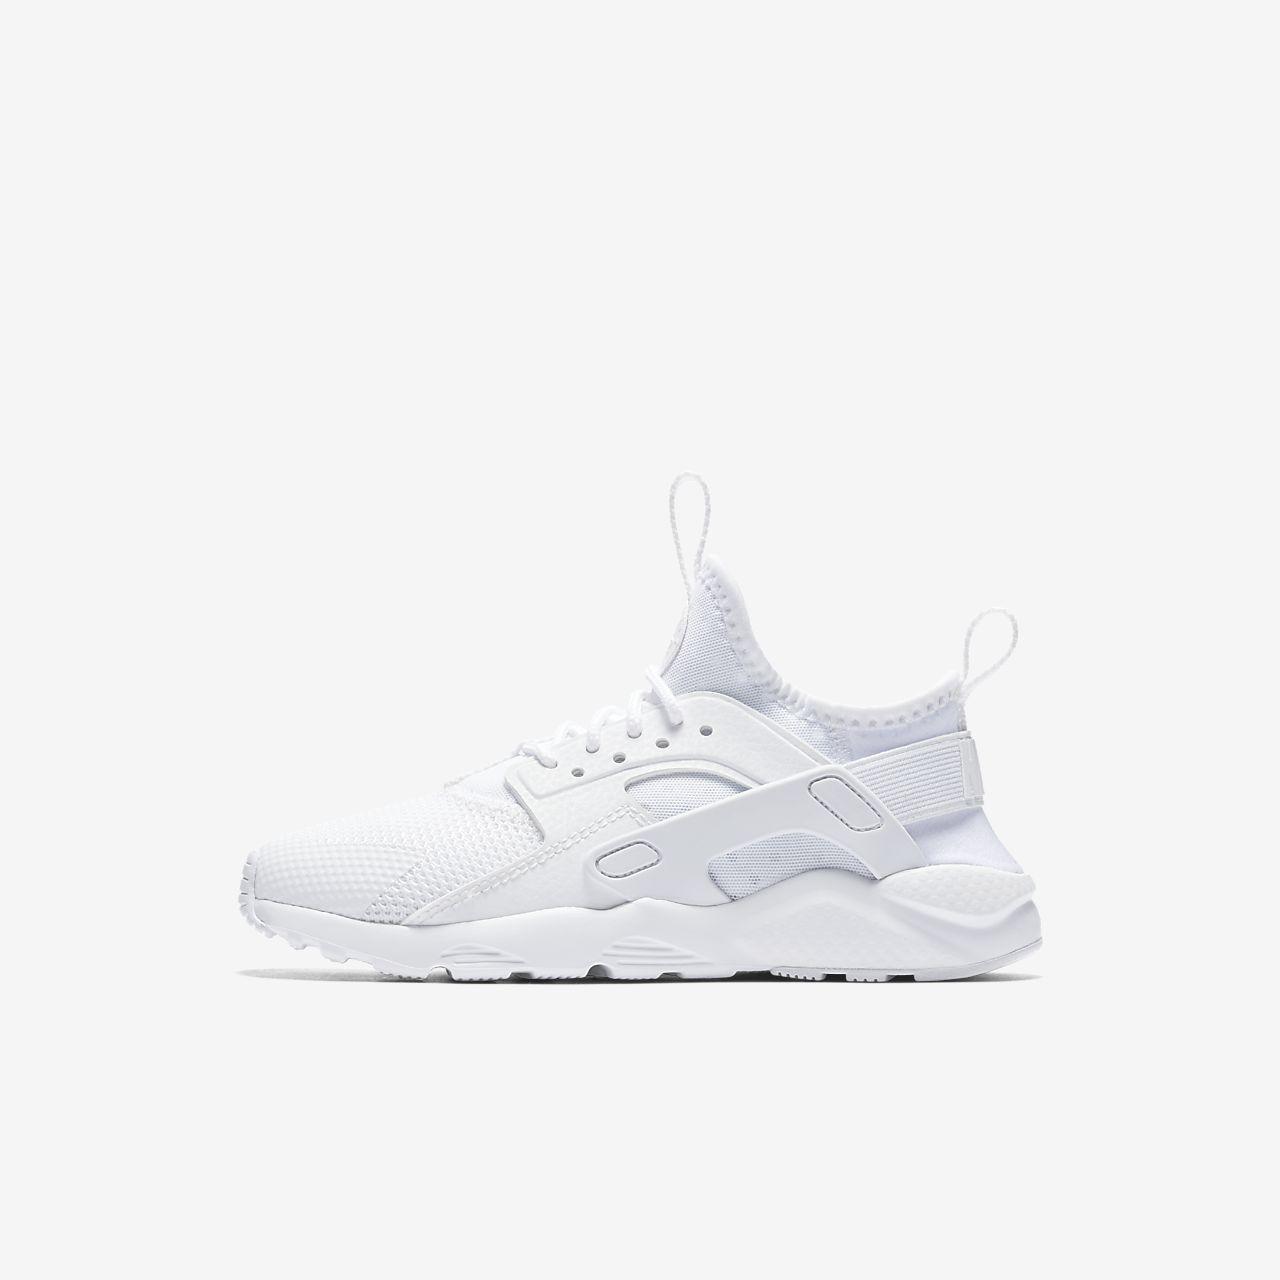 Nike Air Huarache Ultra sko til store børn. Nike DK